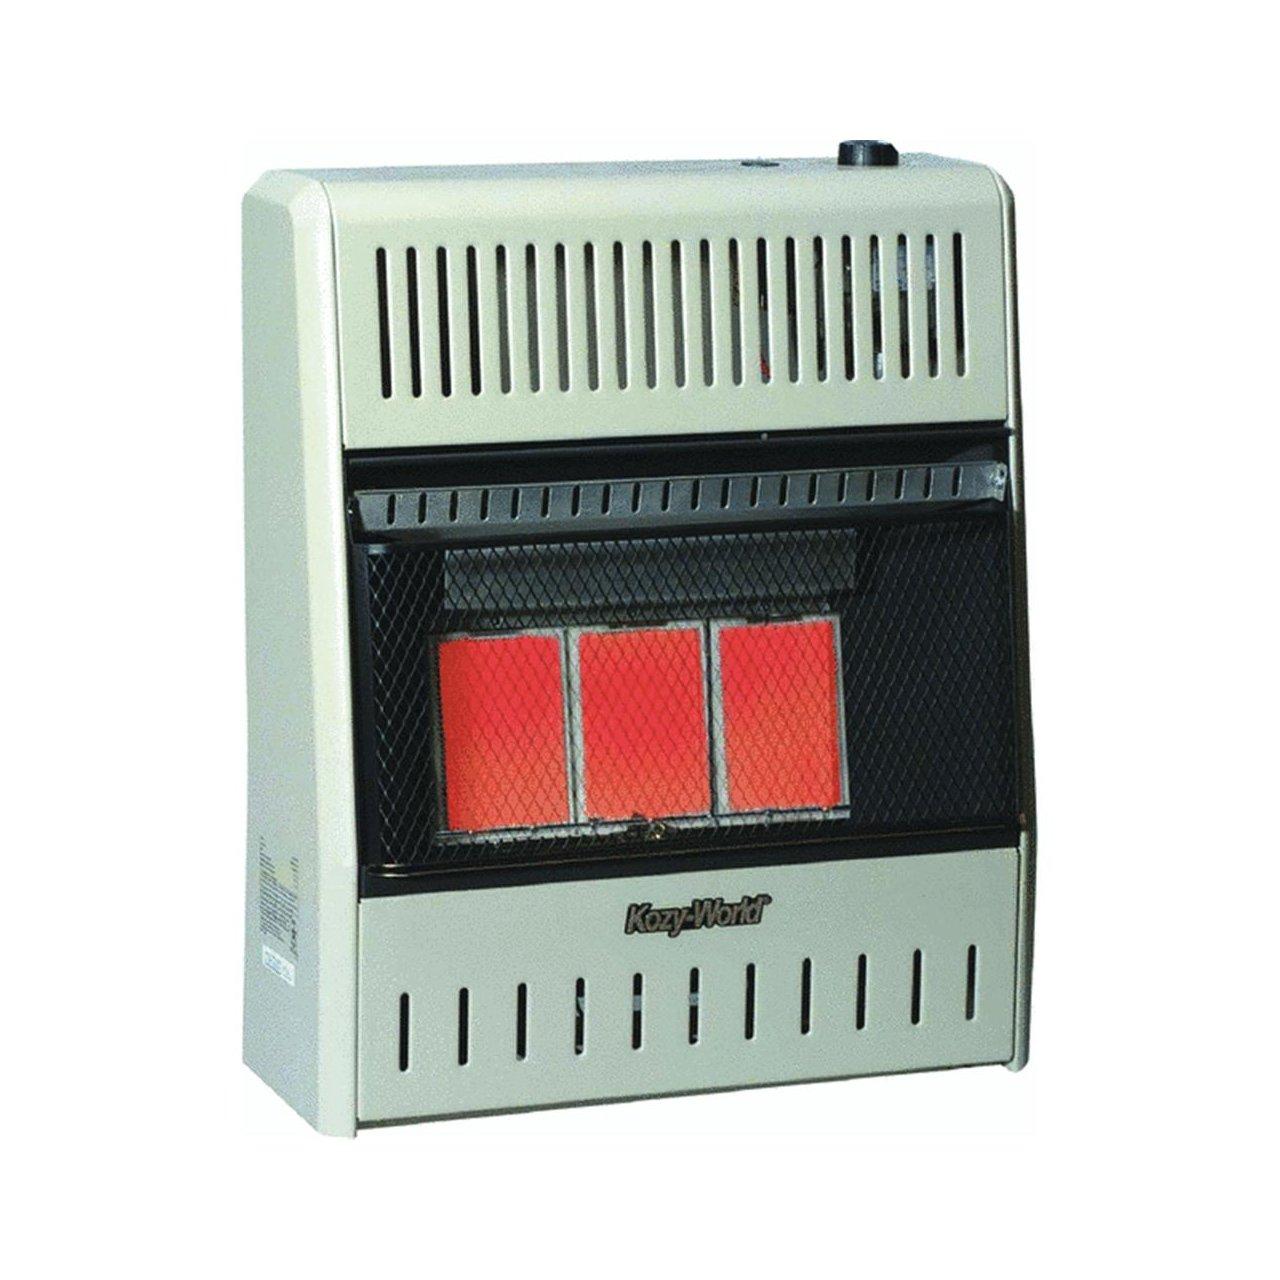 amazon com kozy world kwp192 15 000 btu vent free lp gas infrared